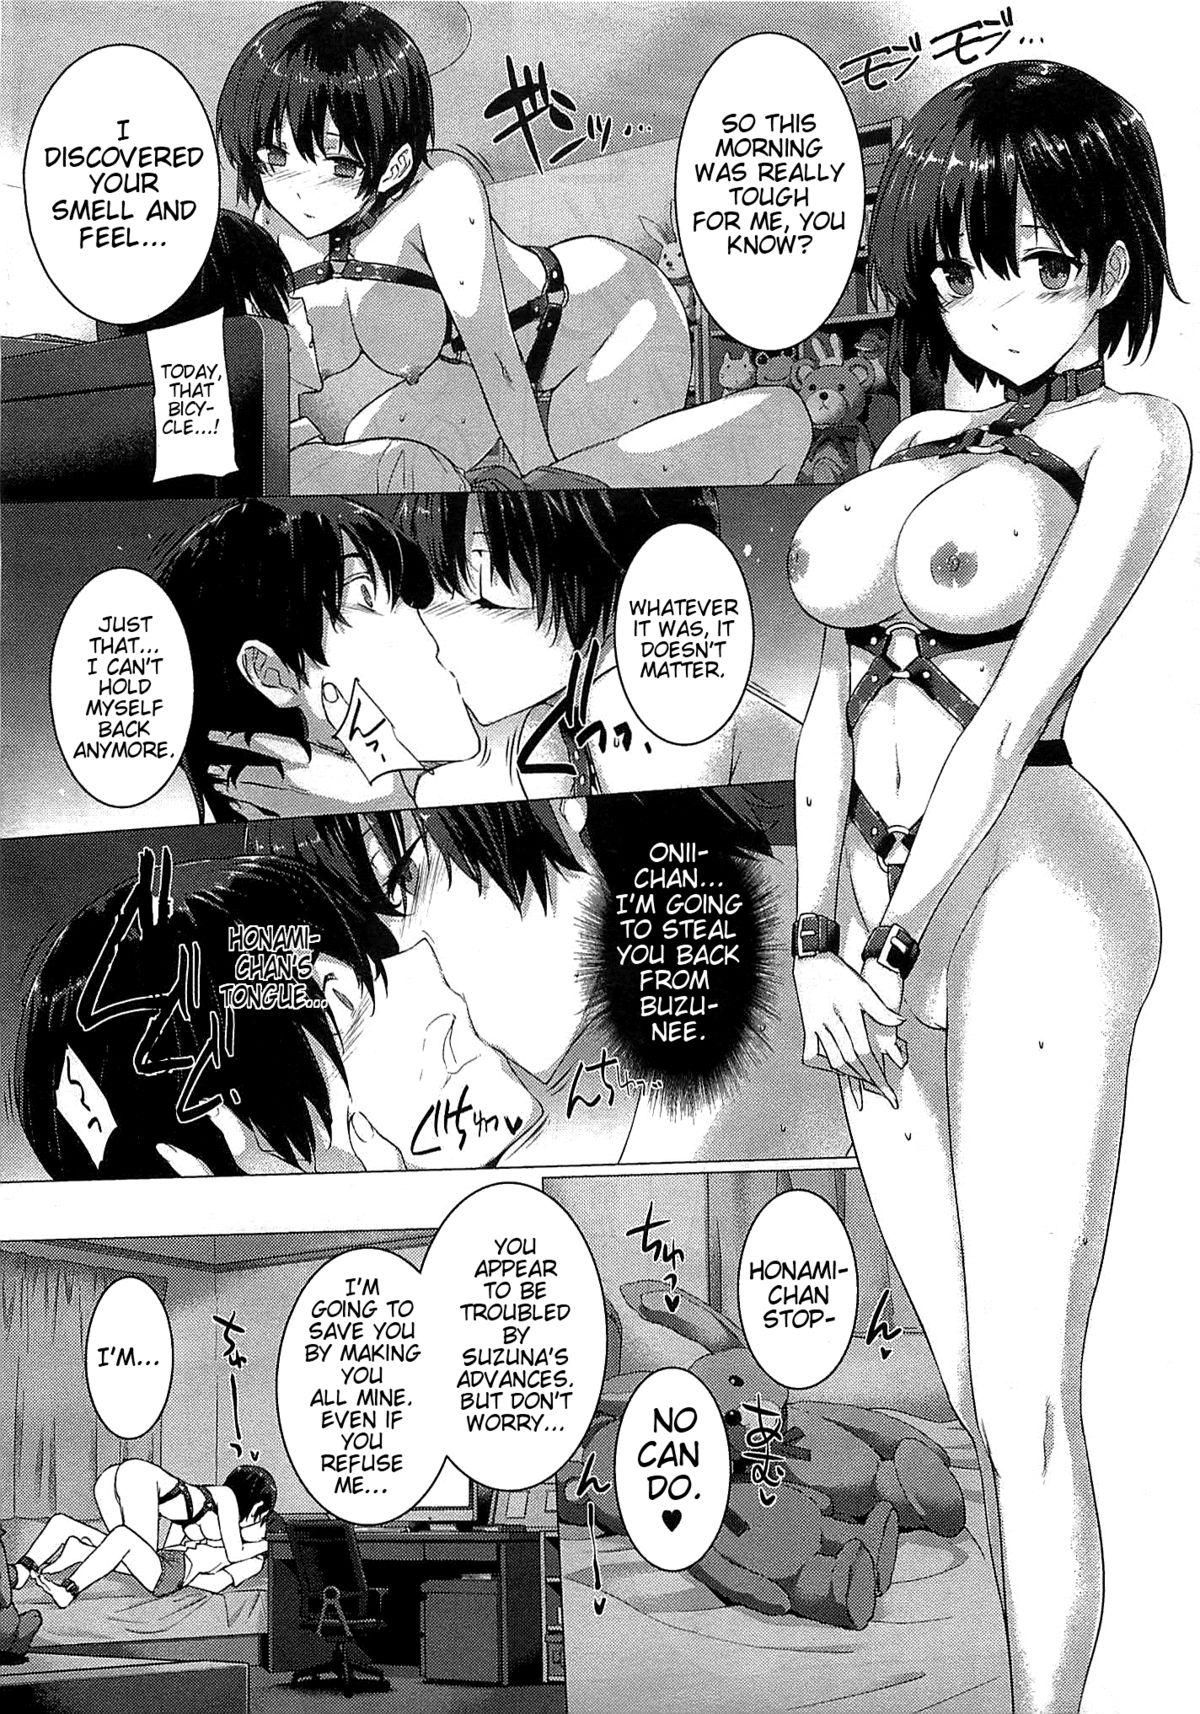 [Katsurai Yoshiaki] Kanojo wa Kazoku de Koibito de Ch. 1-3   She's My Family And My Lover Ch. 1-3 [English] {doujin-moe.us} 40